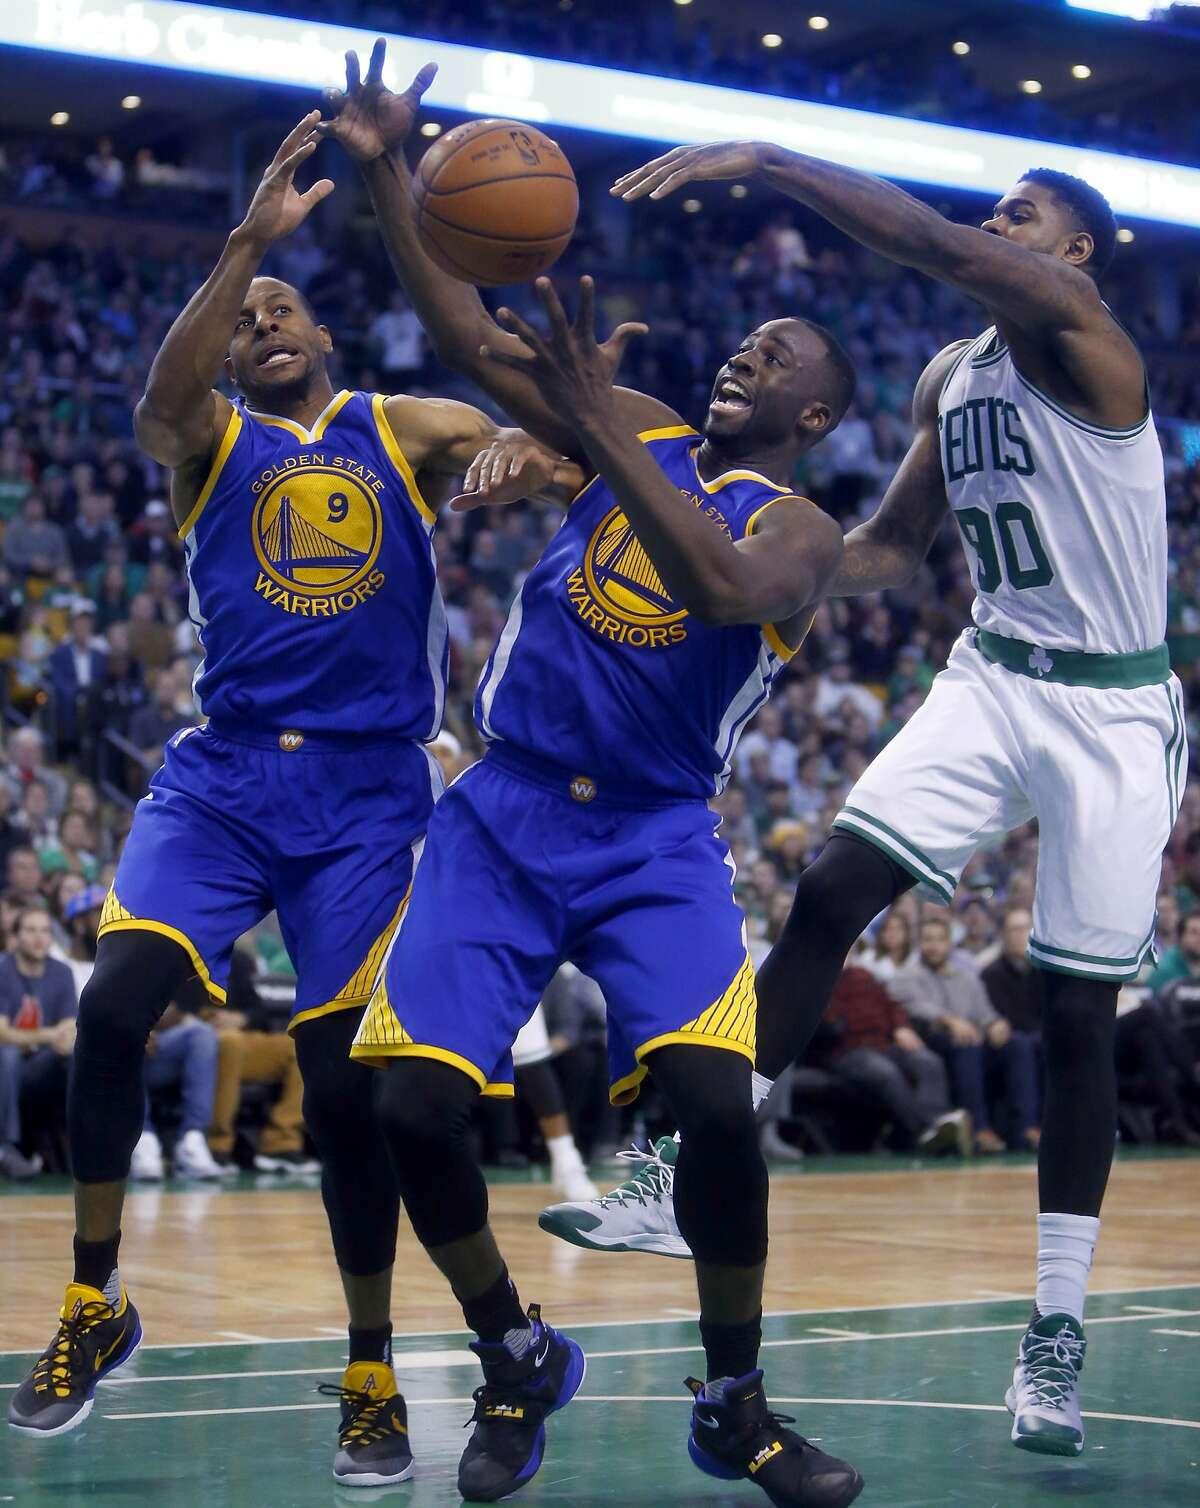 Golden State Warriors' Draymond Green and Andre Iguodala out rebound Boston Celtics' Amir Johnson during Warriors 124-119 double overtime win in NBA game at TD Garden in Boston, Massachusetts on Friday, December 11, 2015.